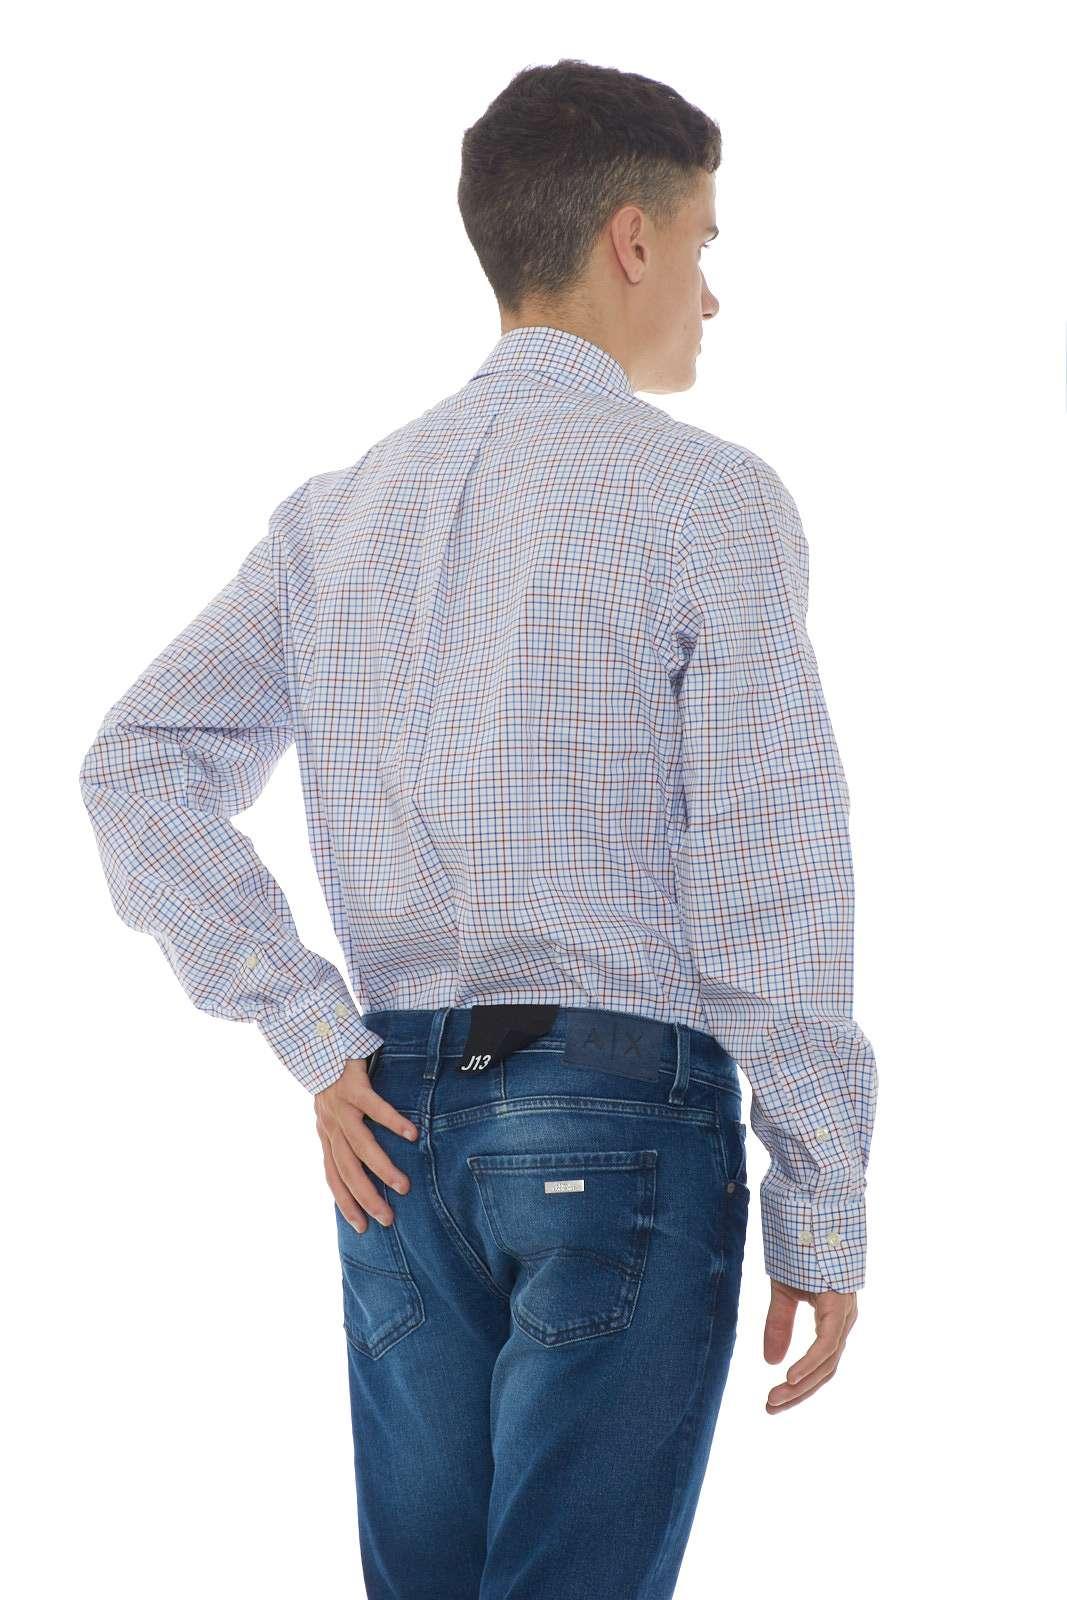 https://www.parmax.com/media/catalog/product/a/i/AI-outlet_parmax-camicia-uomo_Ralph-Lauren-712766318005-C.jpg